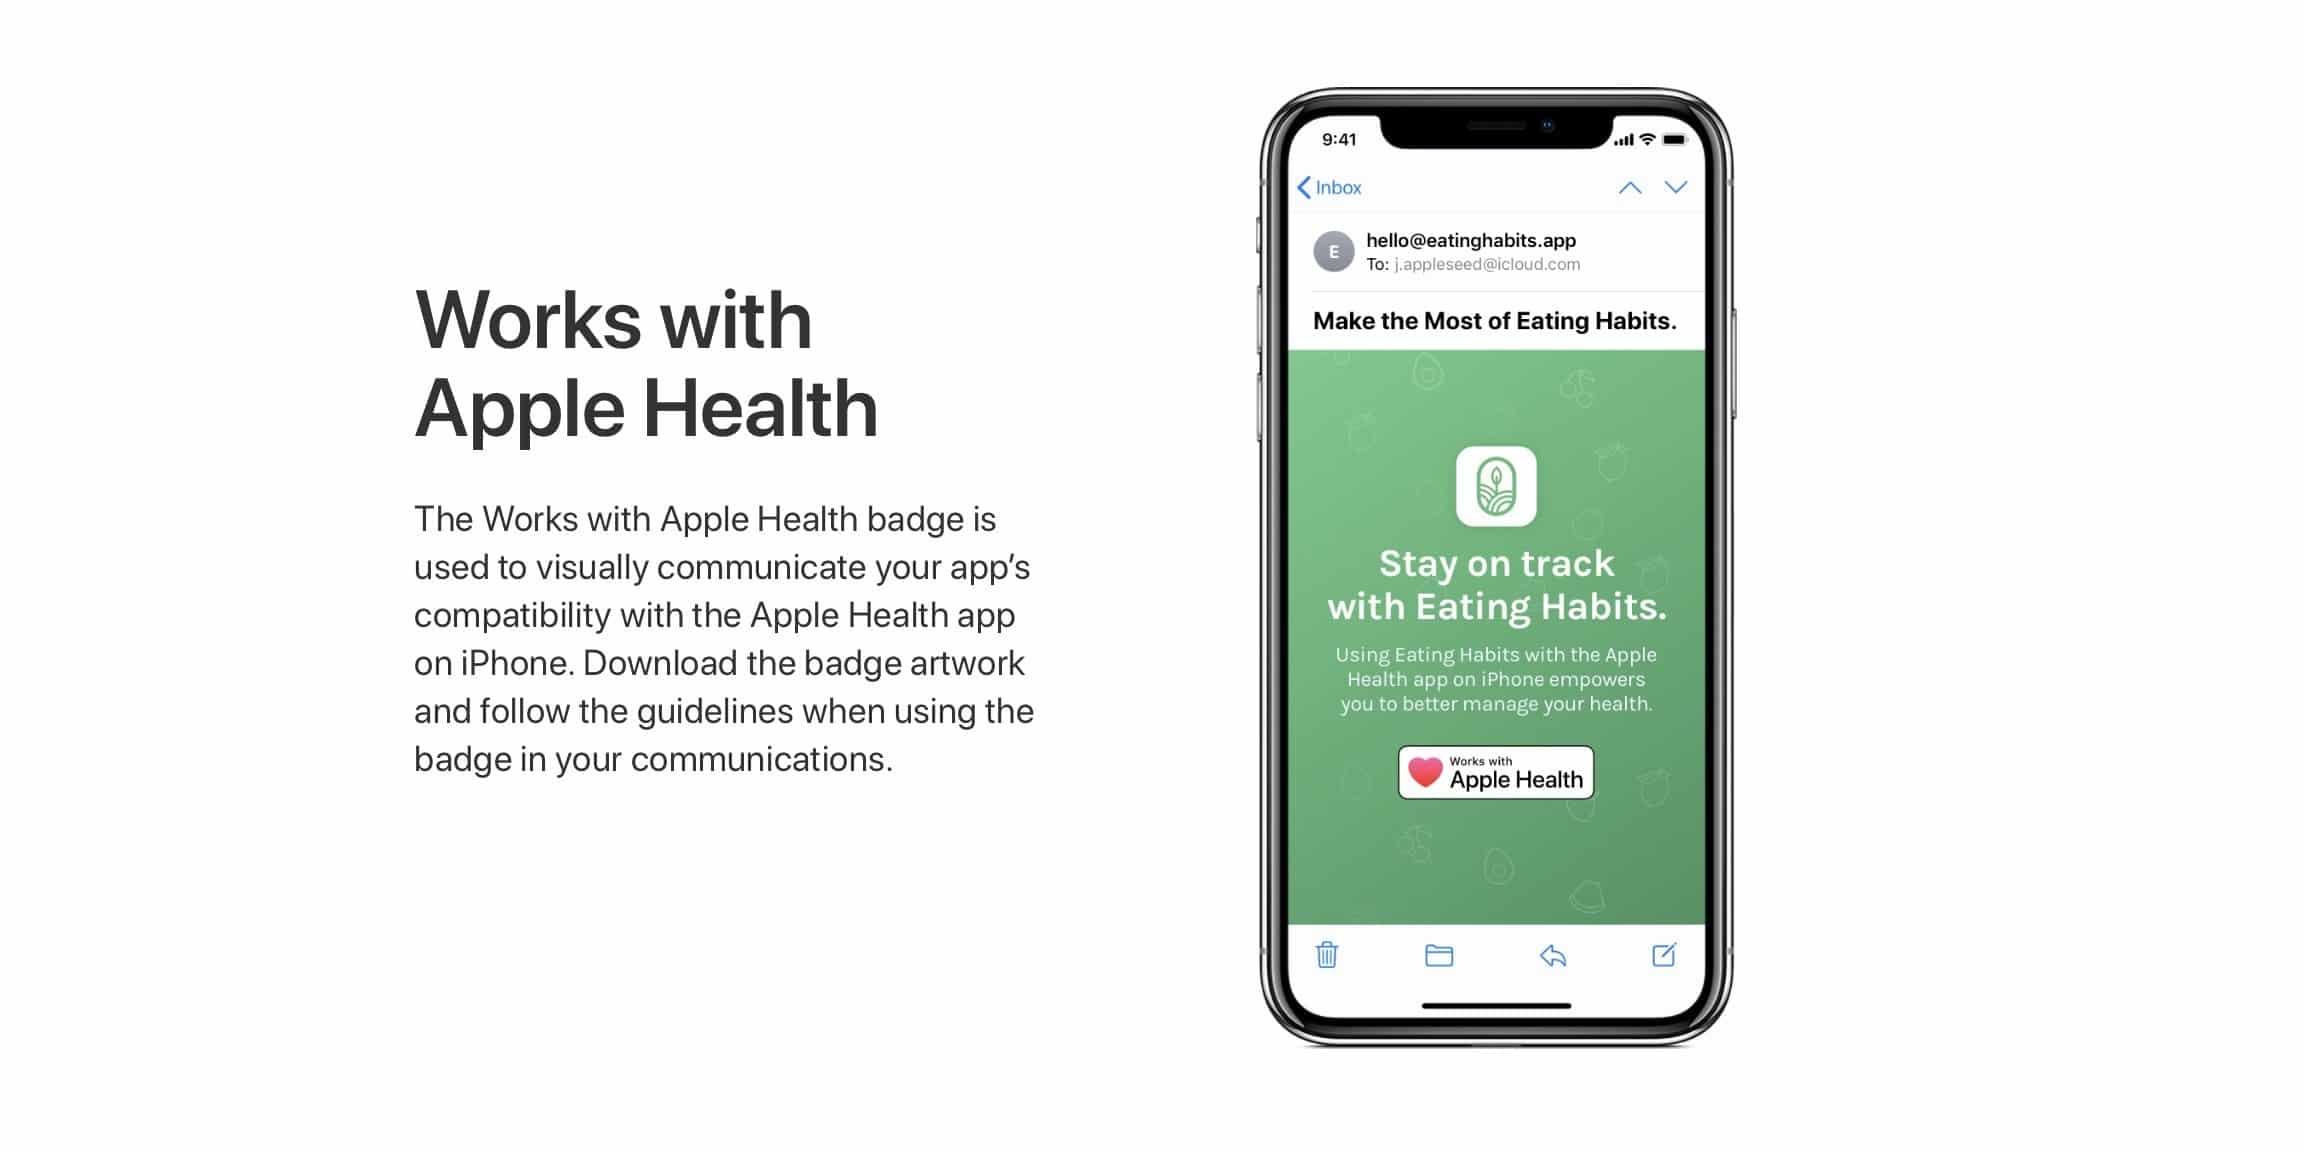 Diretrizes do selo Works With Apple Health